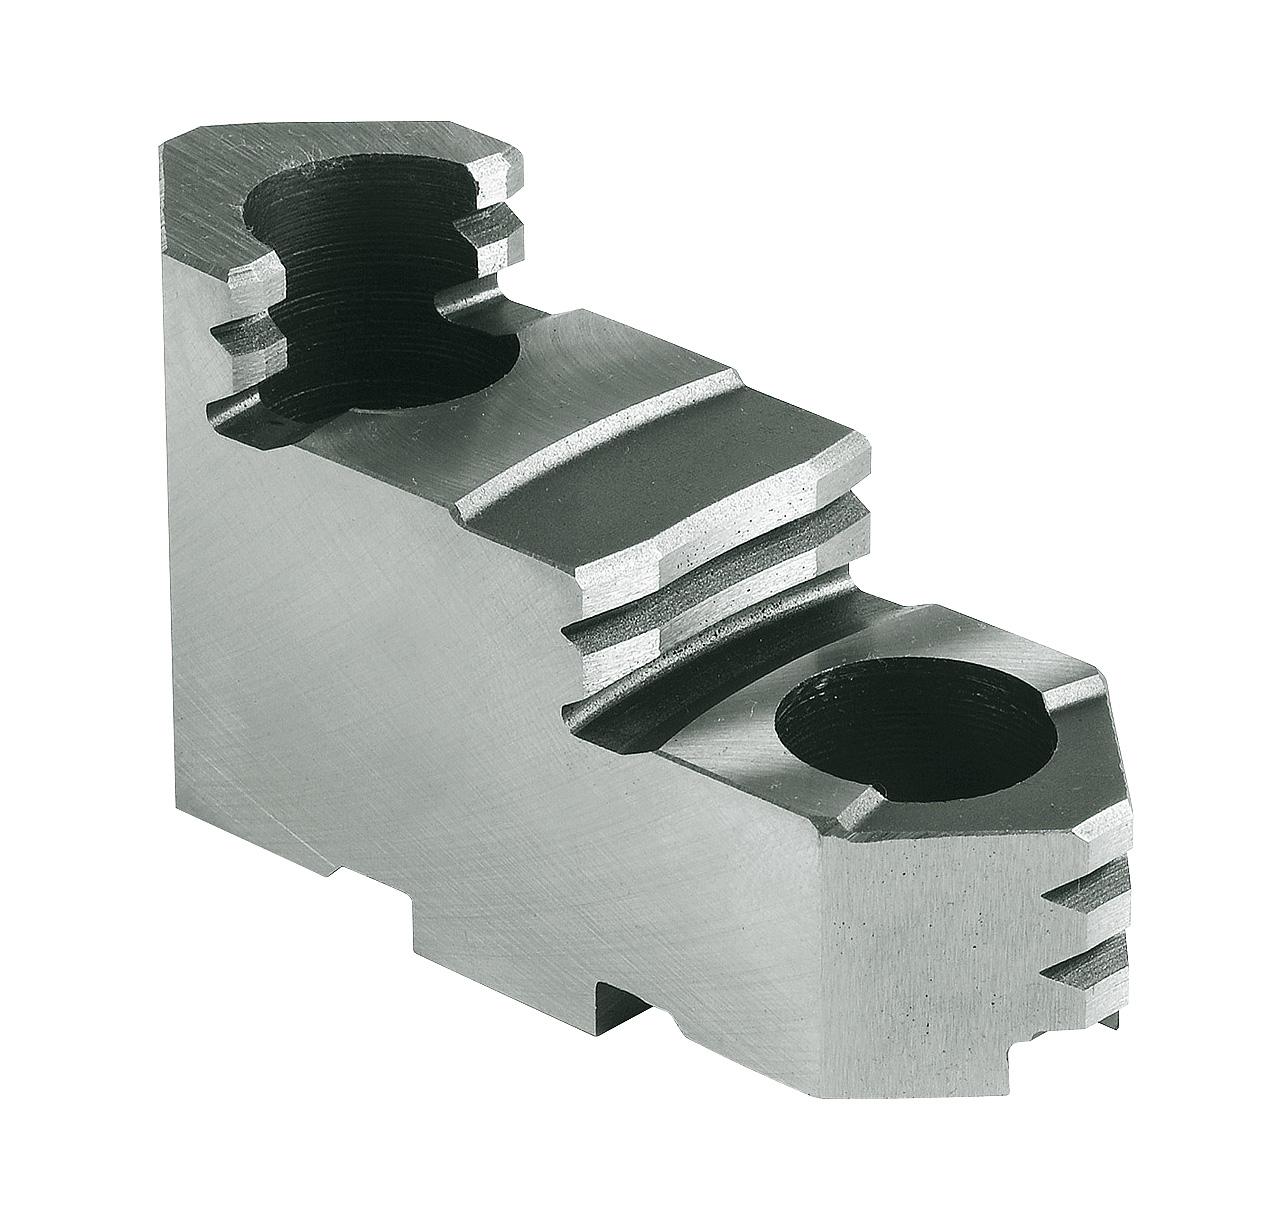 Szczęki górne twarde - komplet DTJ-DK11-400 BERNARDO